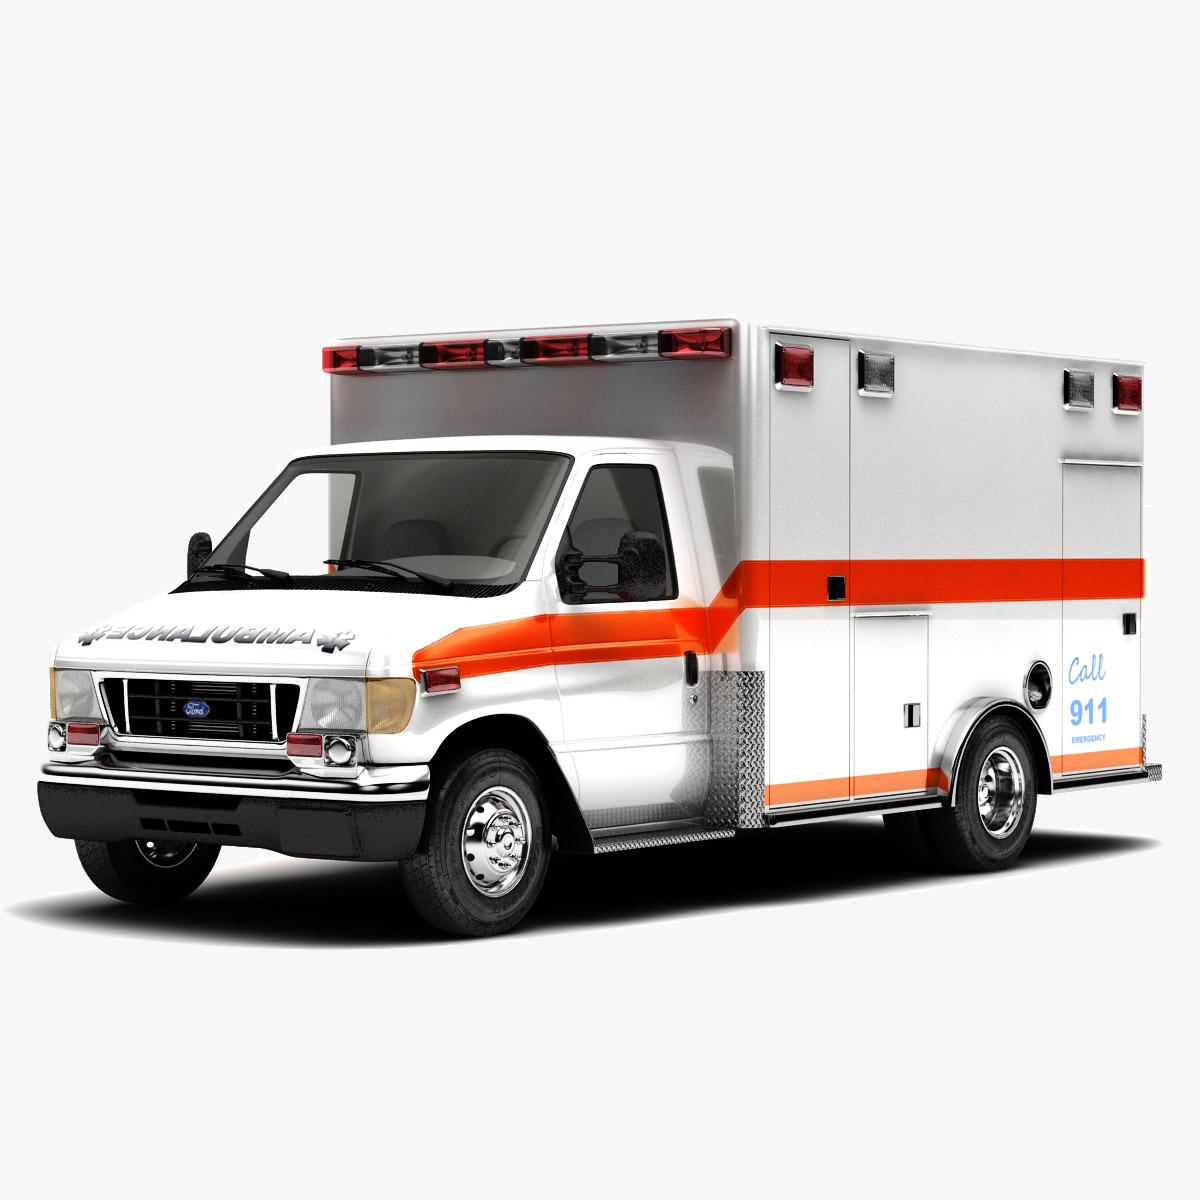 Ford_E350_Road_Rescue_Type_3_Ambulance_2005___0001.jpg